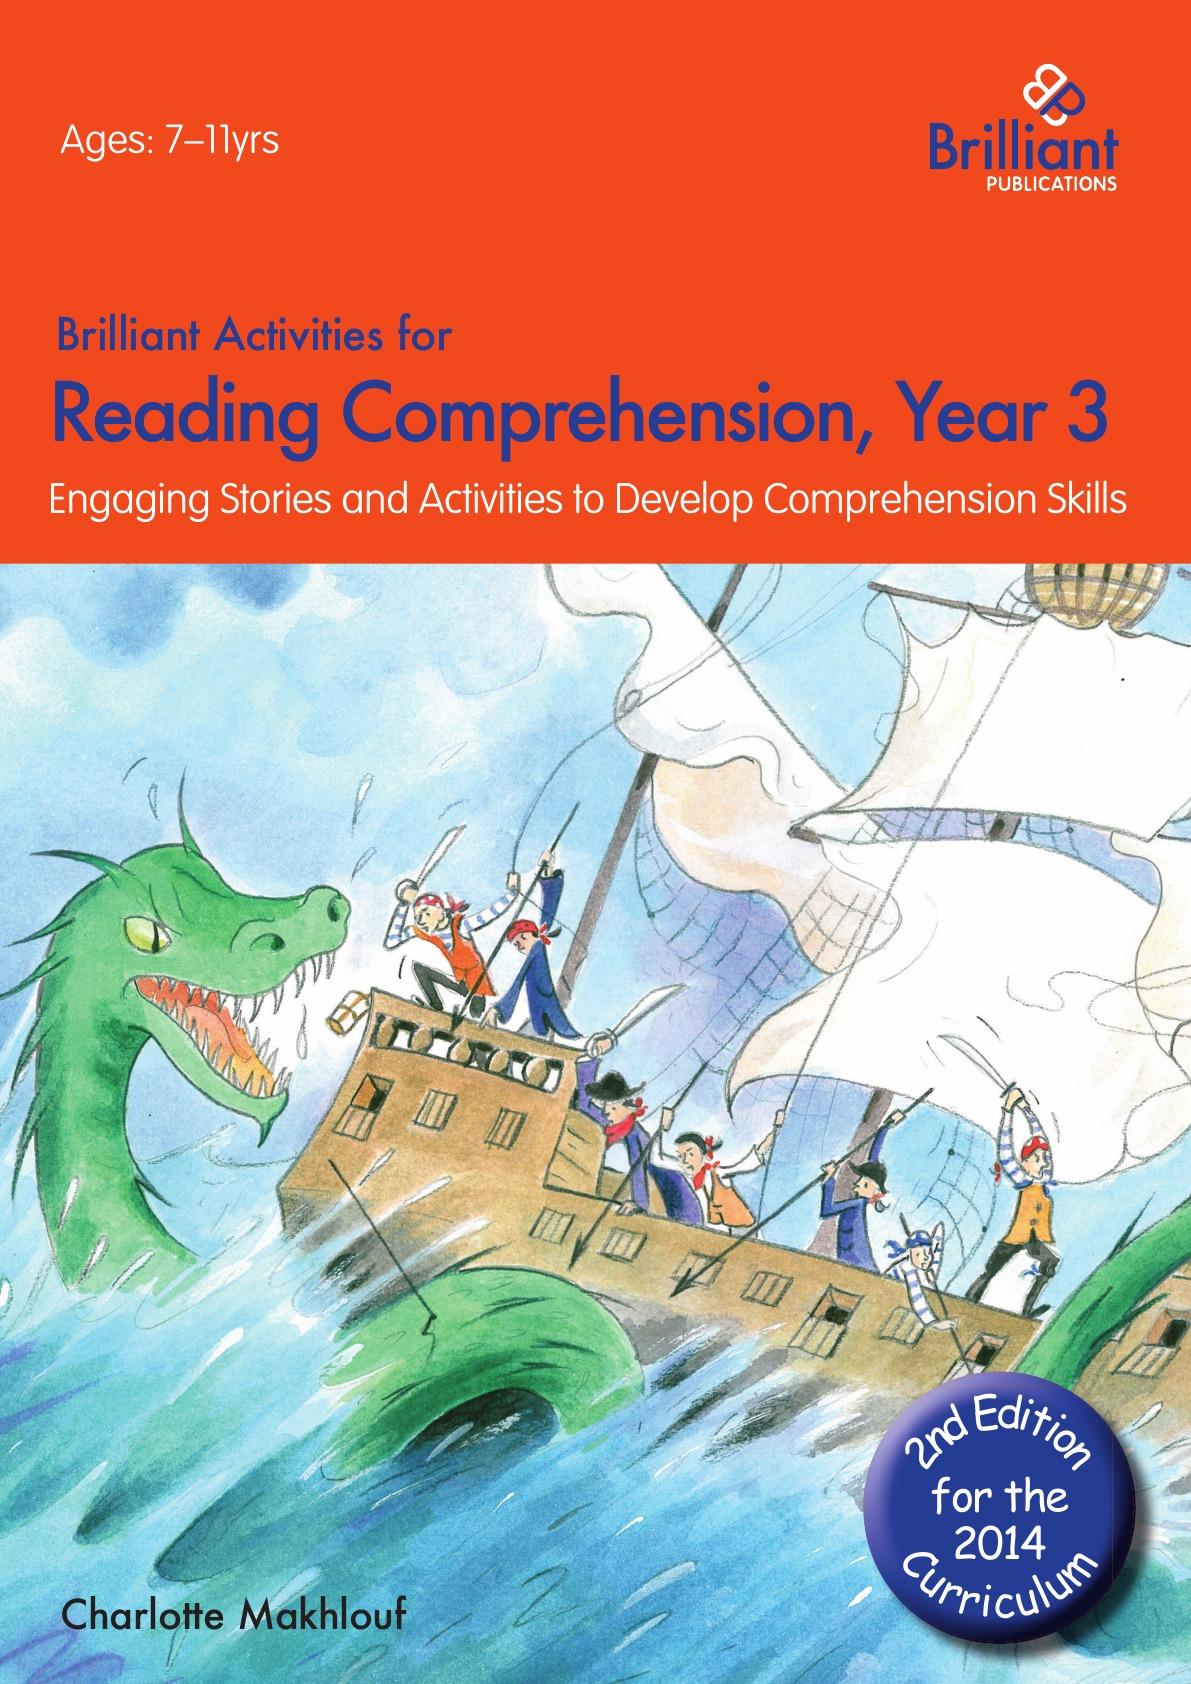 Charlotte Makhlouf Brilliant Activities for Reading Comprehension, Year 3 (2nd Edition) zarei abbas ali rahmany ramin shakoori neya sepide reading comprehension